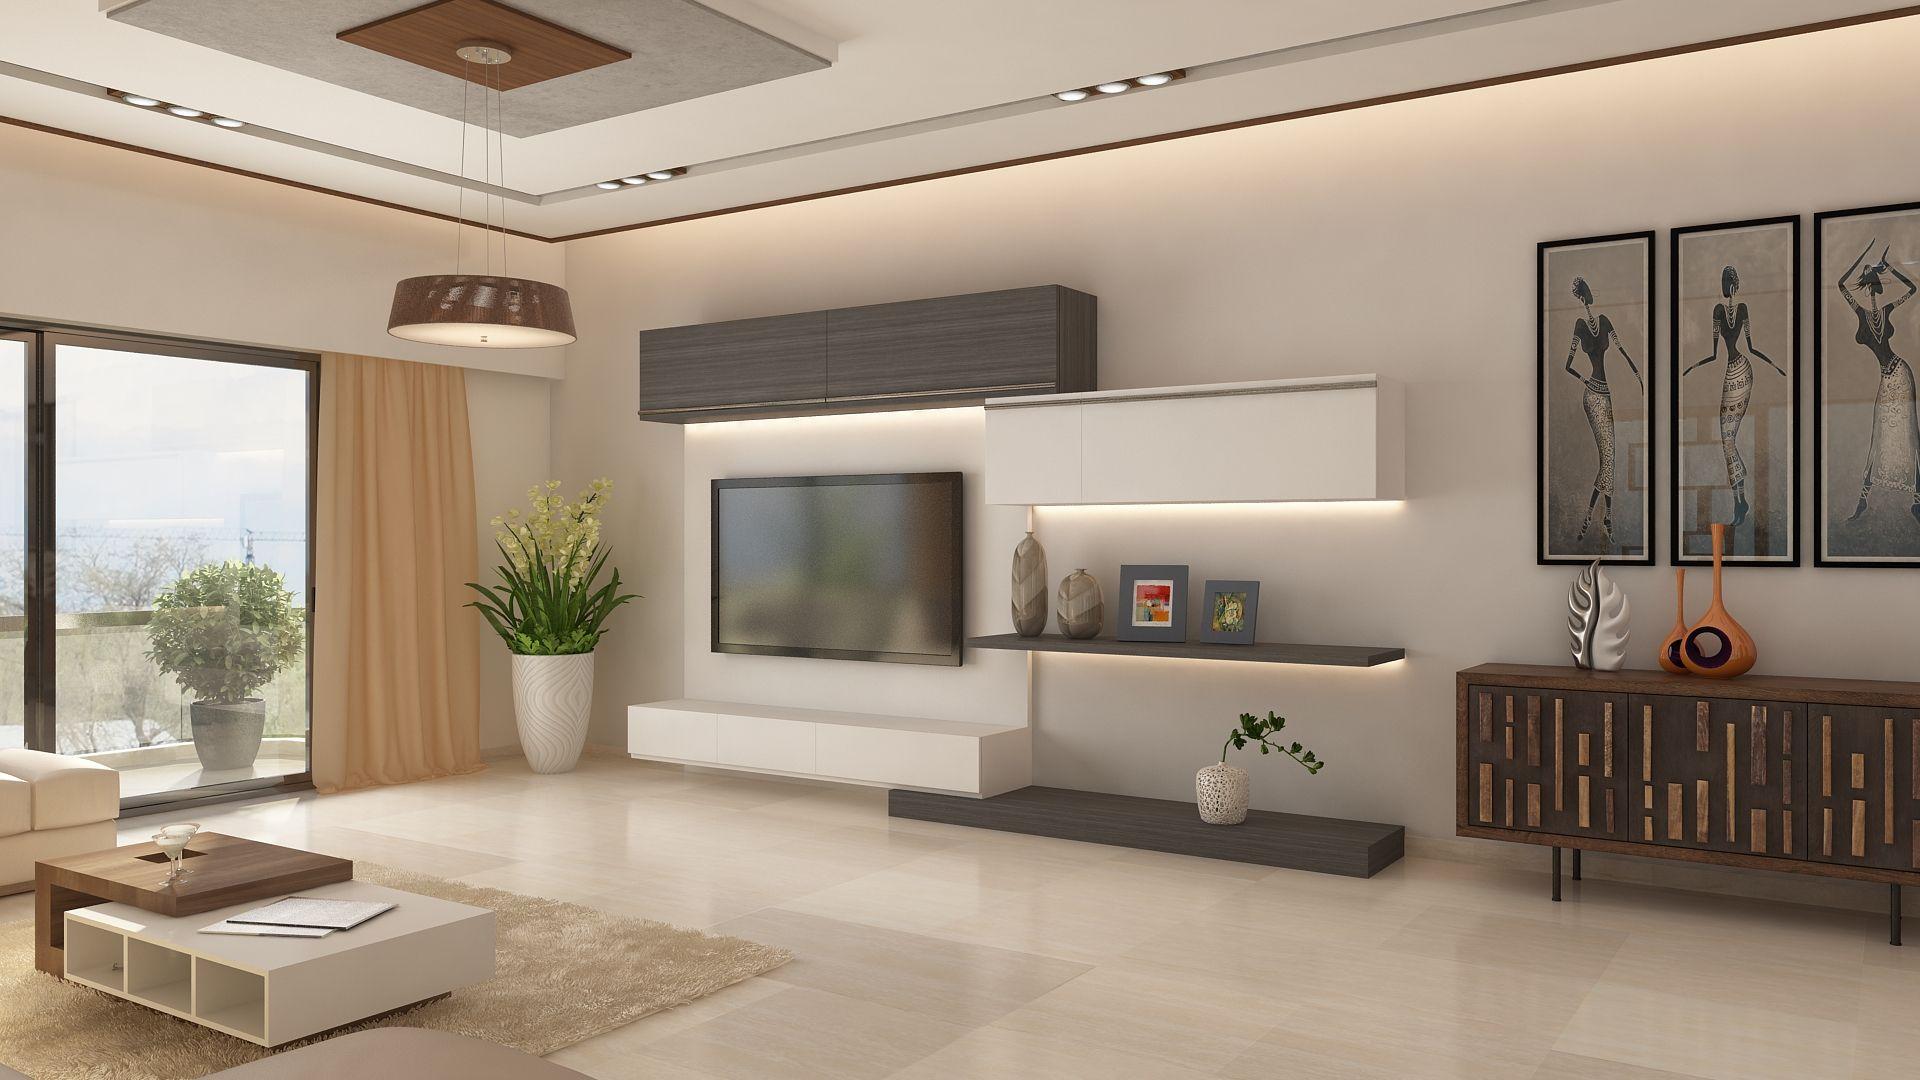 Designer Wall Units For Living Room Adorable Bathroom Doors In Bangalore  Lah  Pinterest  Bathroom Doors Design Decoration